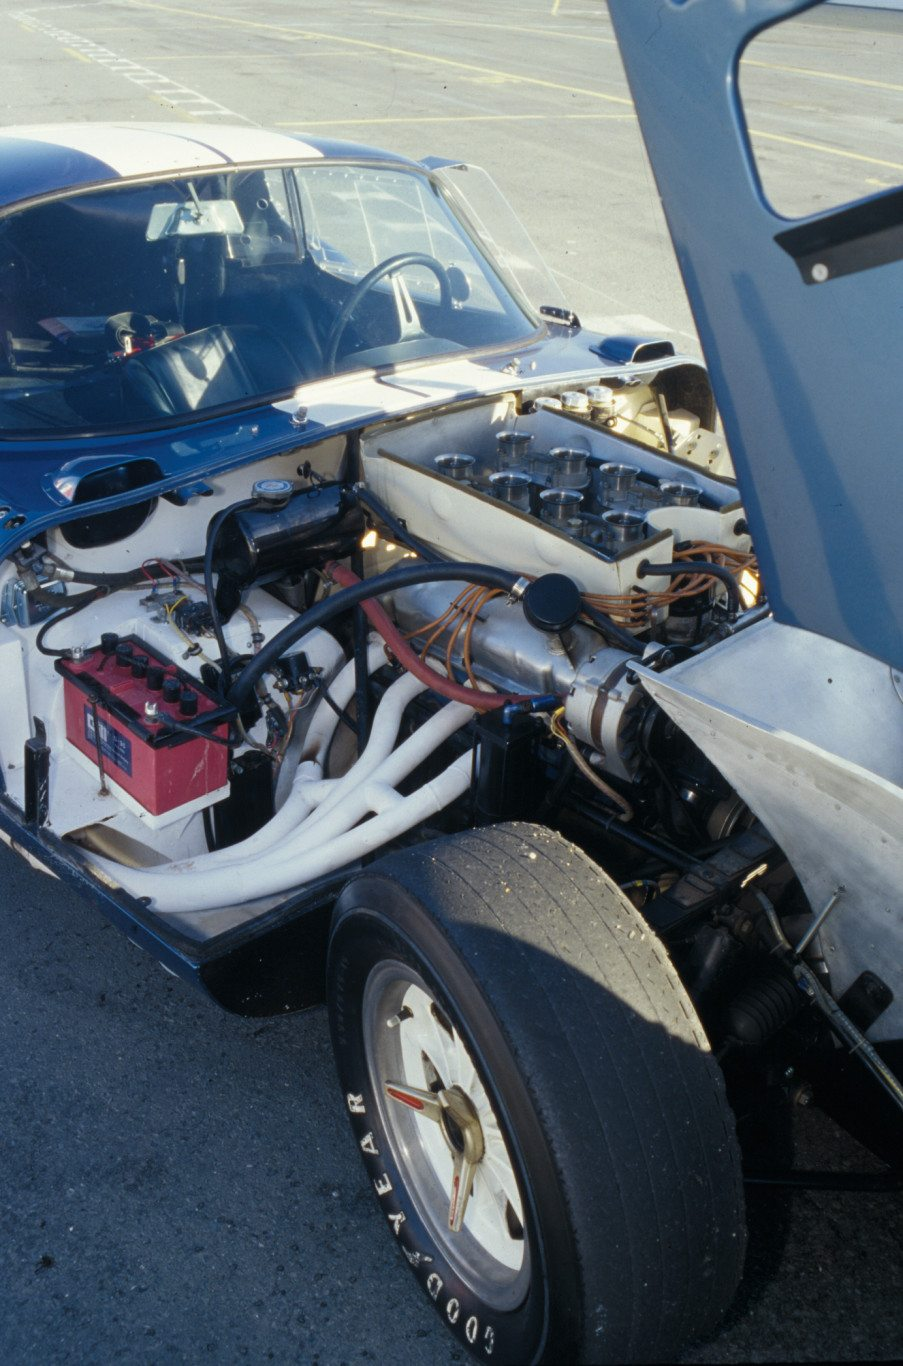 Shelby Daytona Coupe 289ci V8 Engine